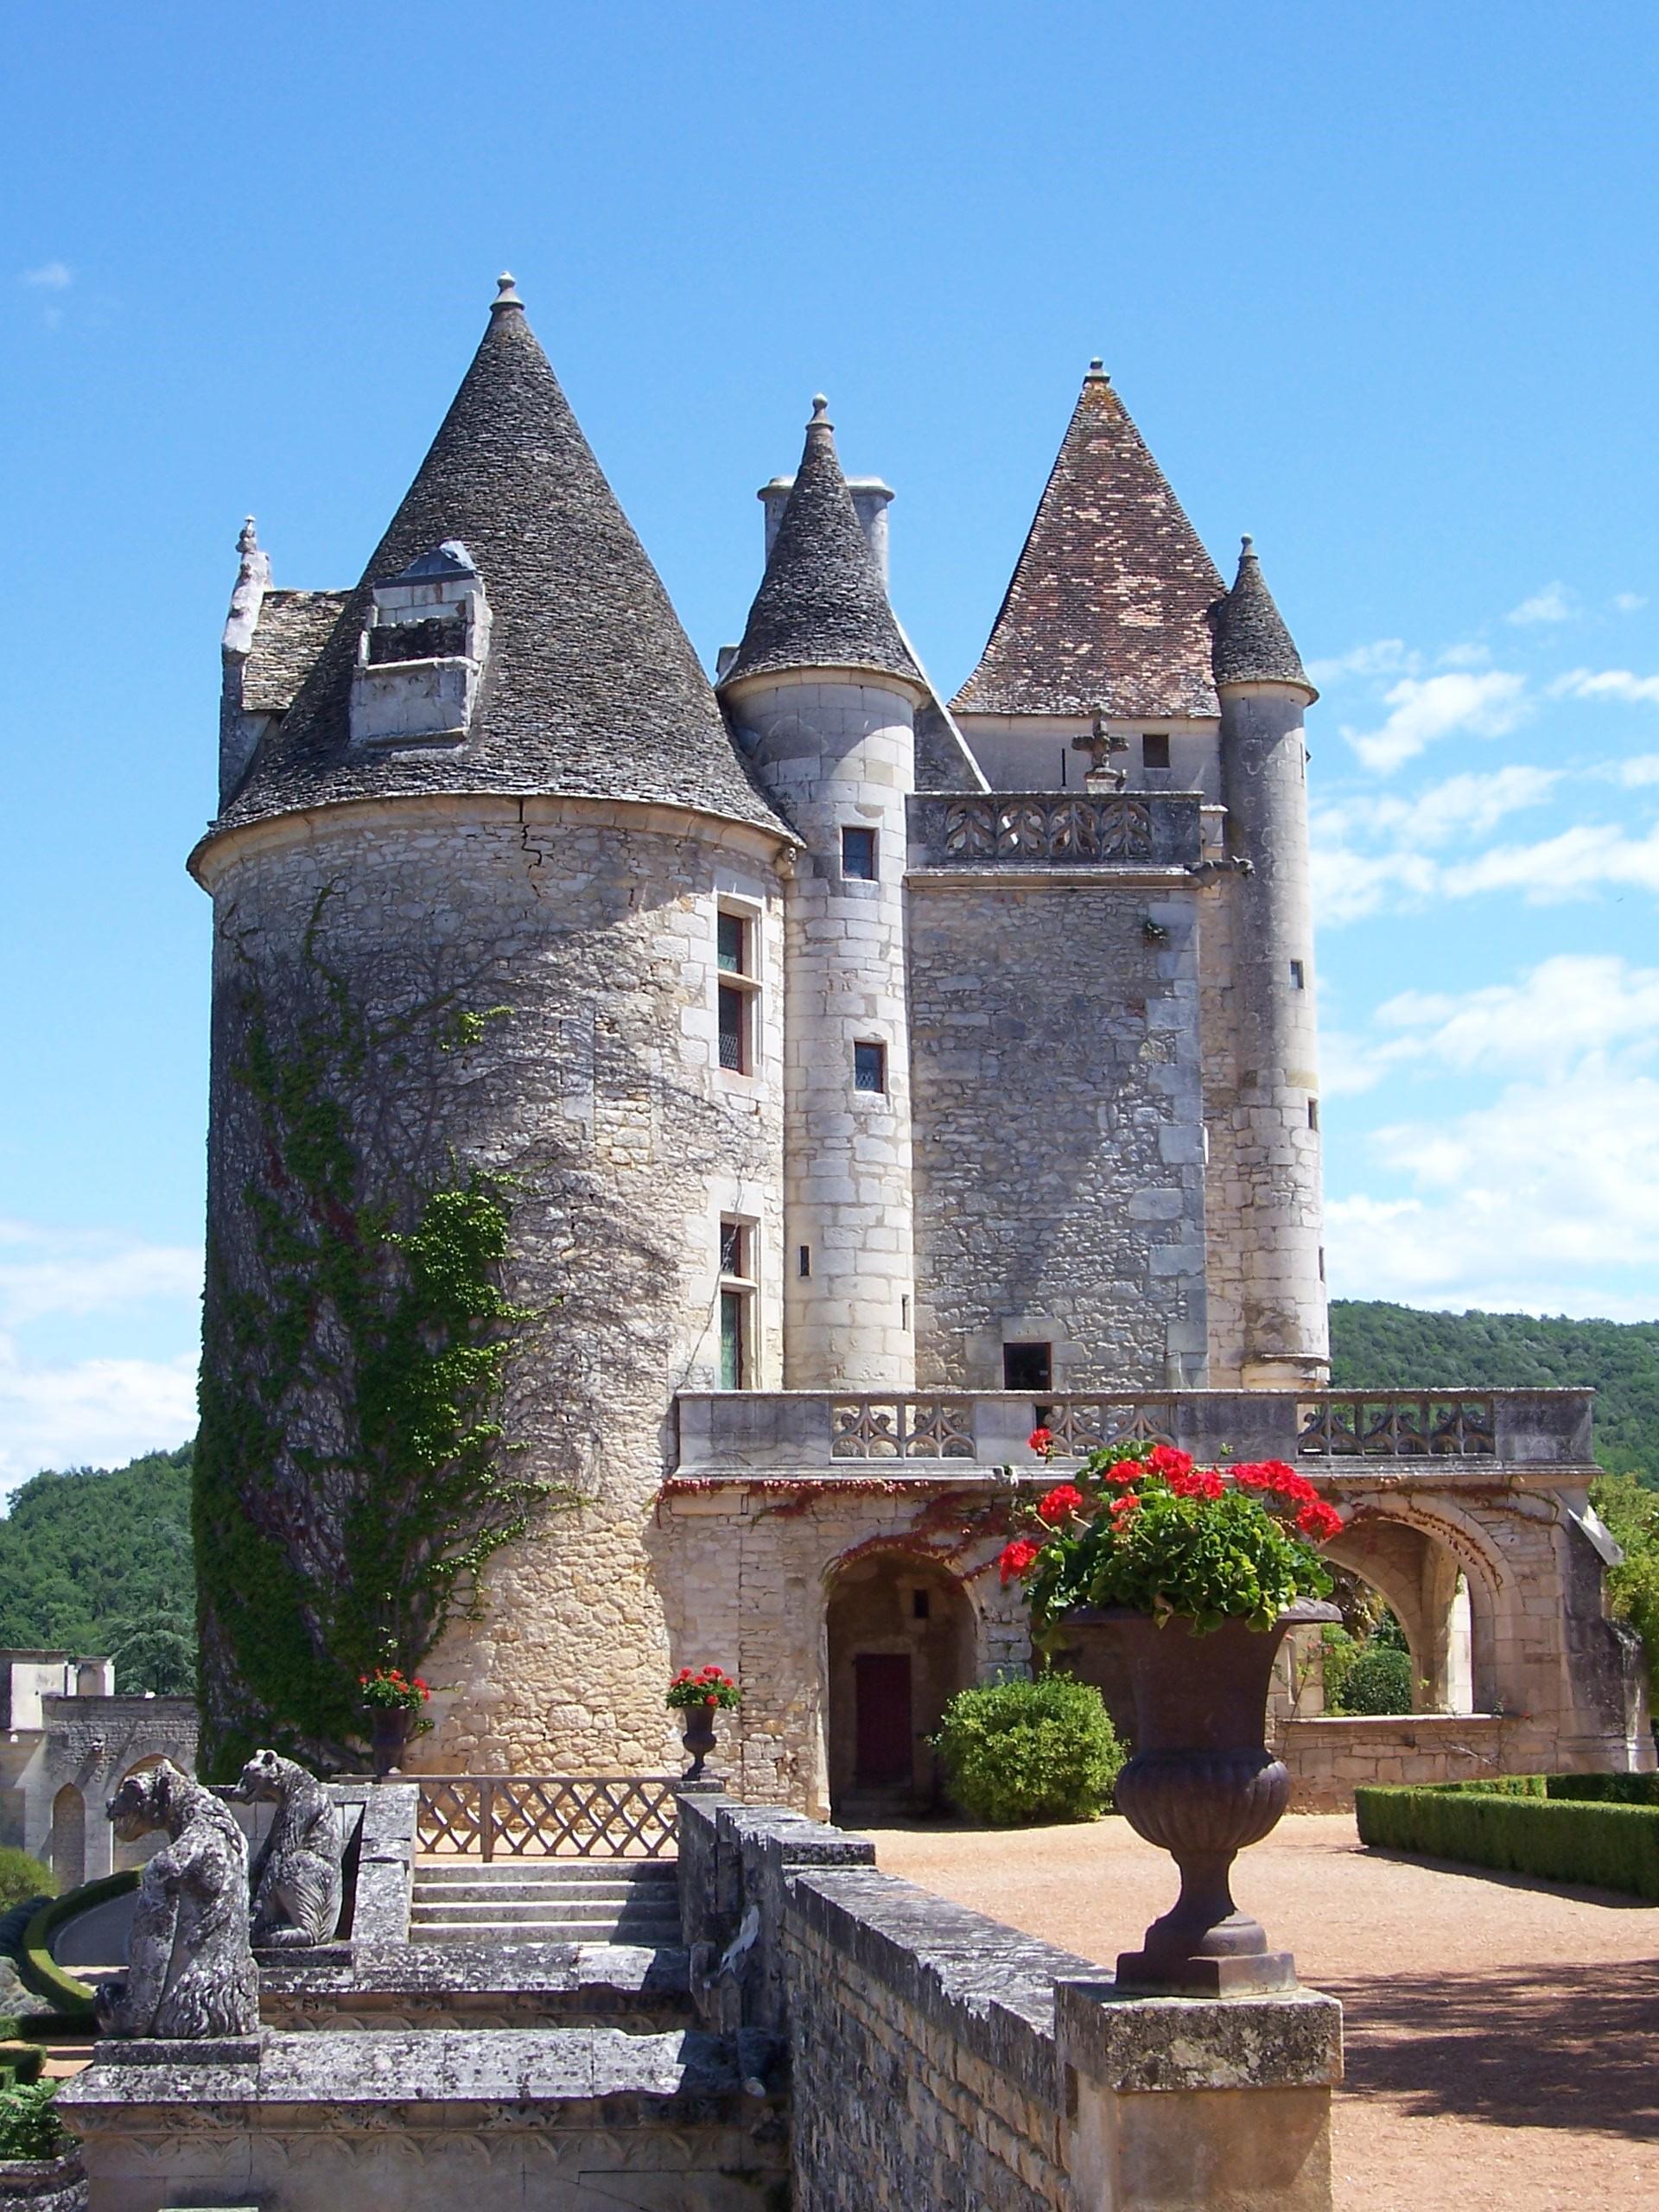 Lorraine Wilson – French Chateau